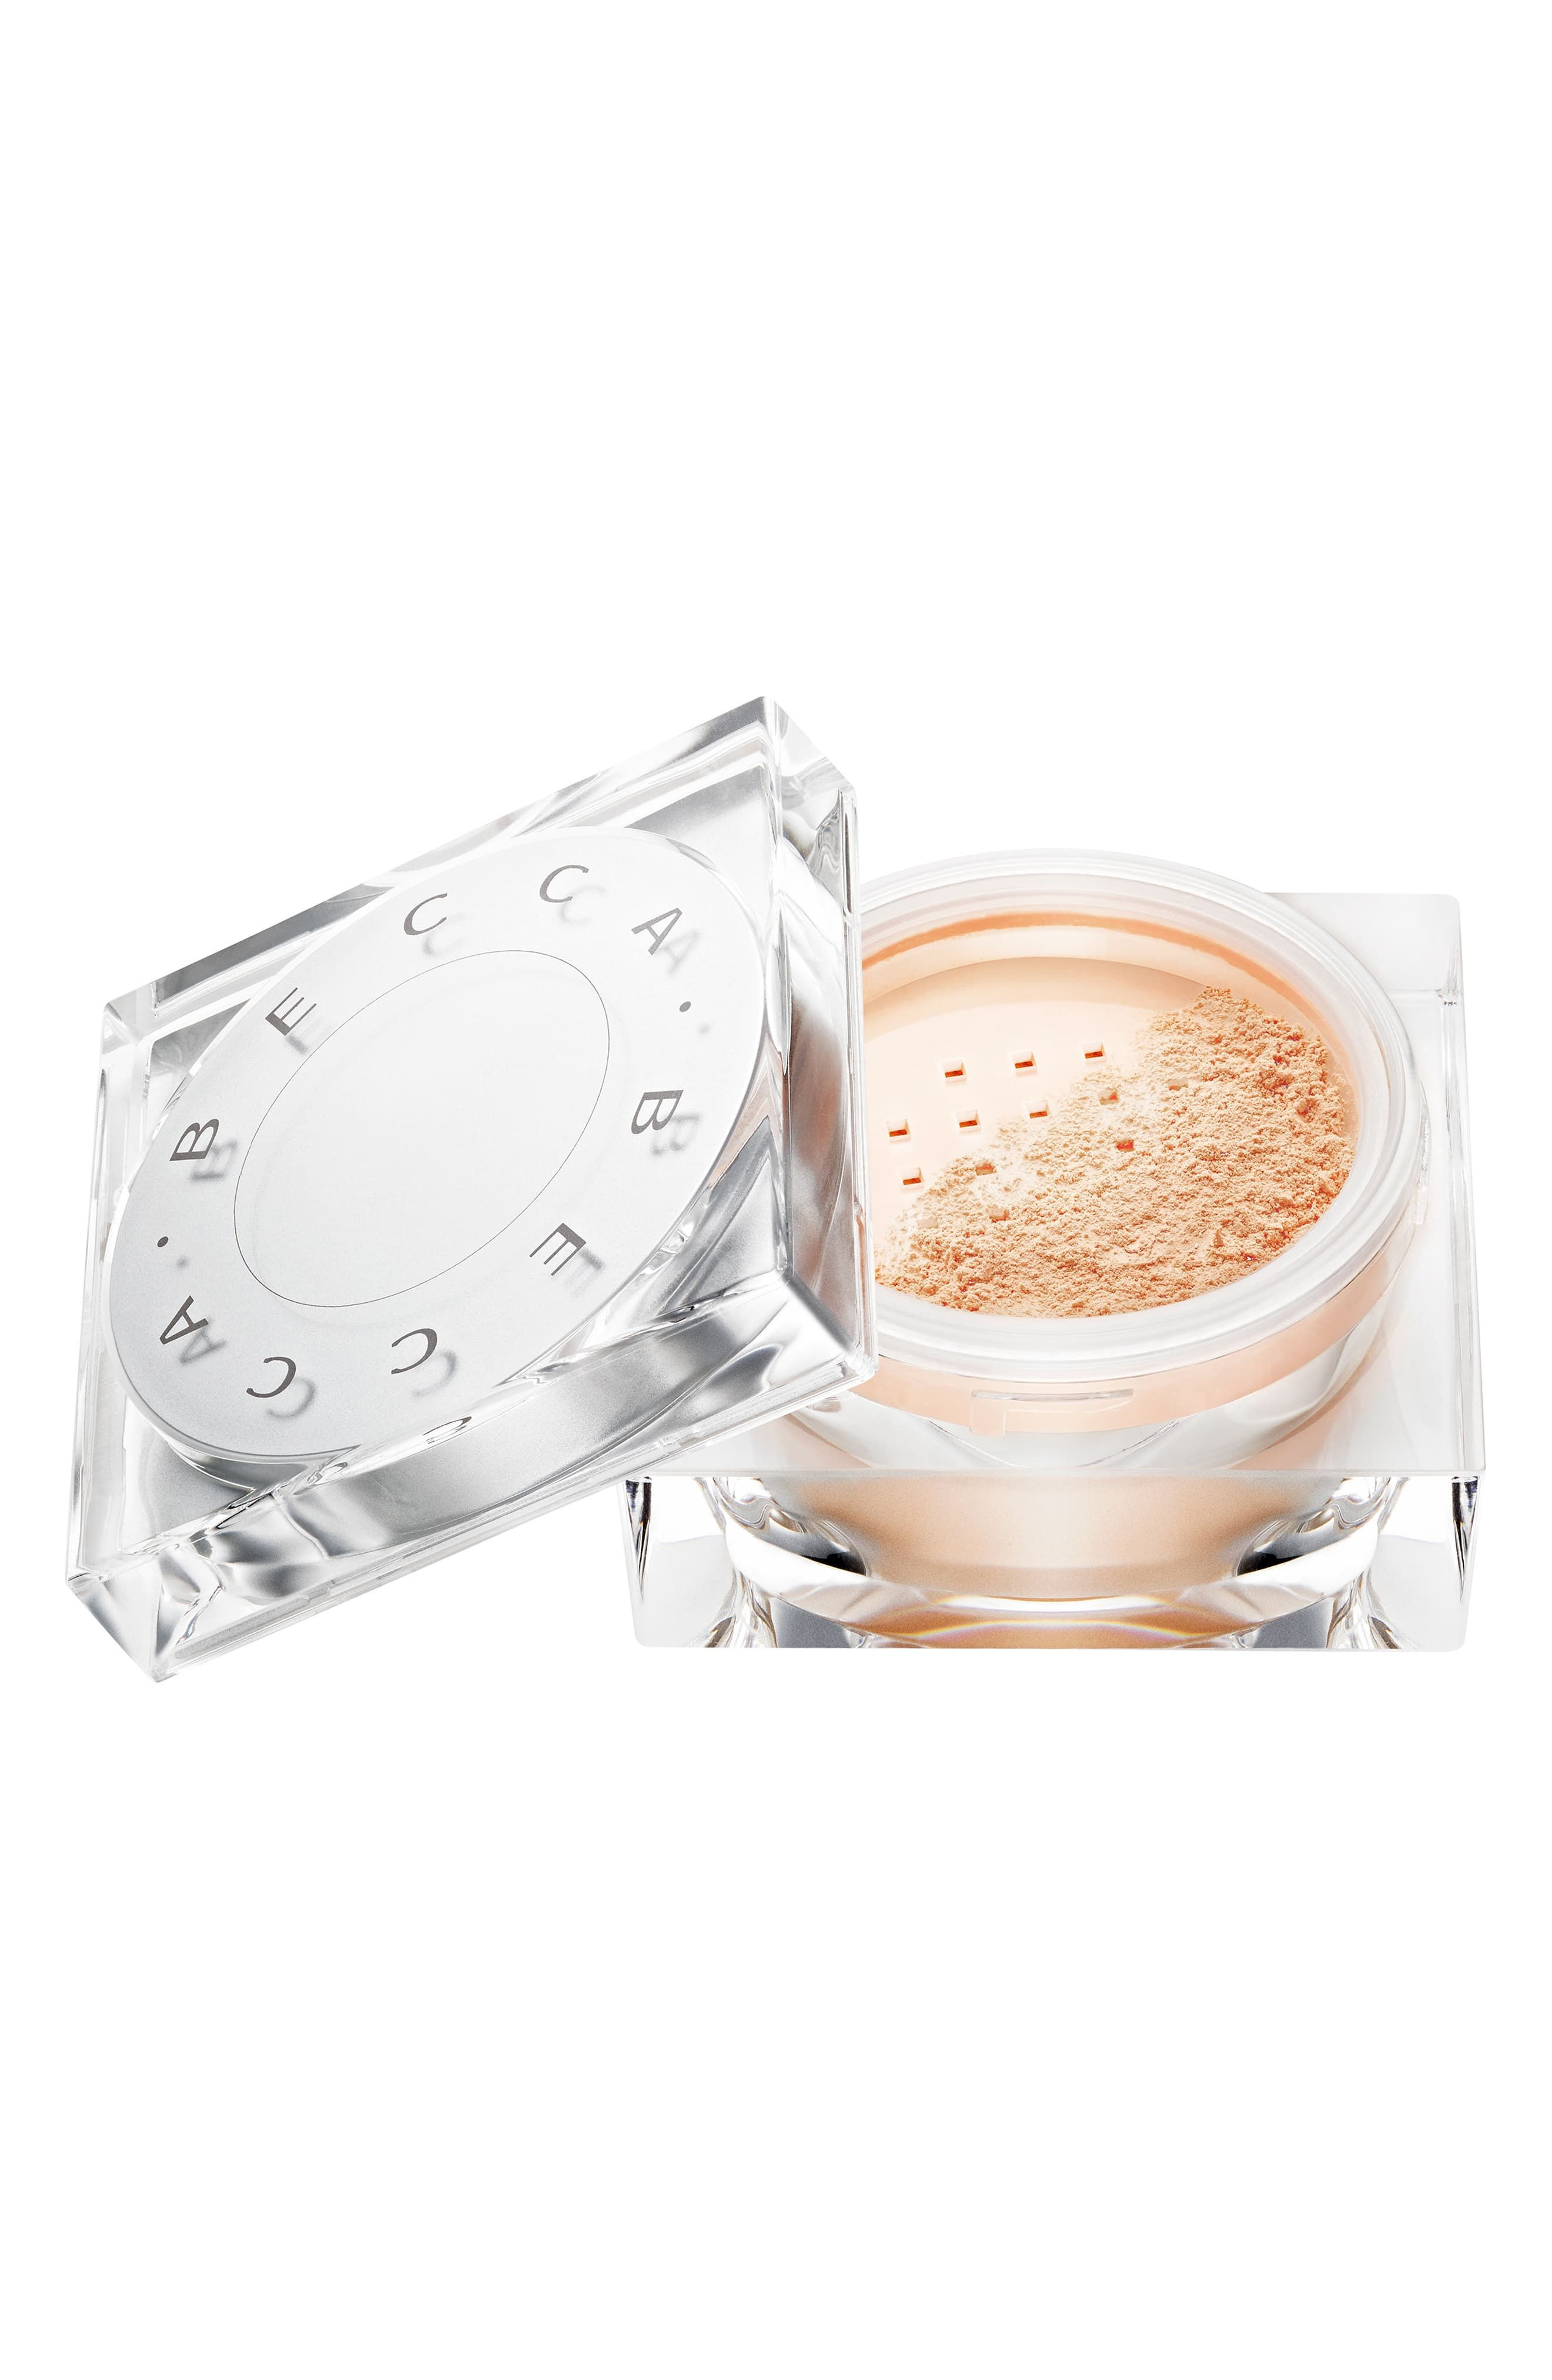 Becca Soft Light Blurring Powder Setting Powder Becca Cosmetics